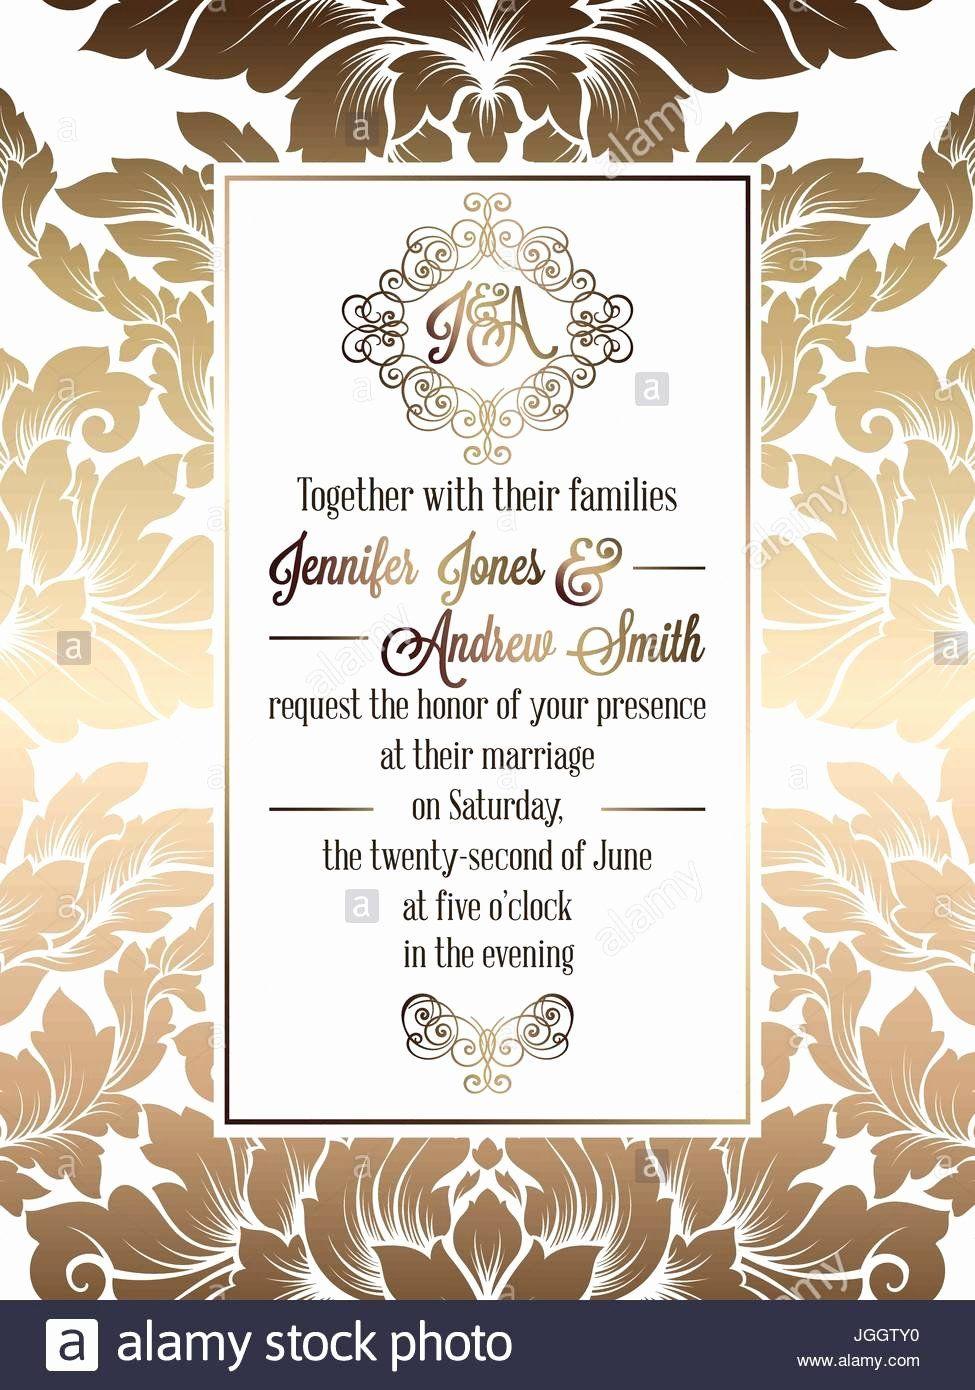 Formal Wedding Invitation Template Beautiful Vintage Baroque Style Wedd Wedding Invitation Card Template Formal Wedding Invitations Classic Wedding Invitations